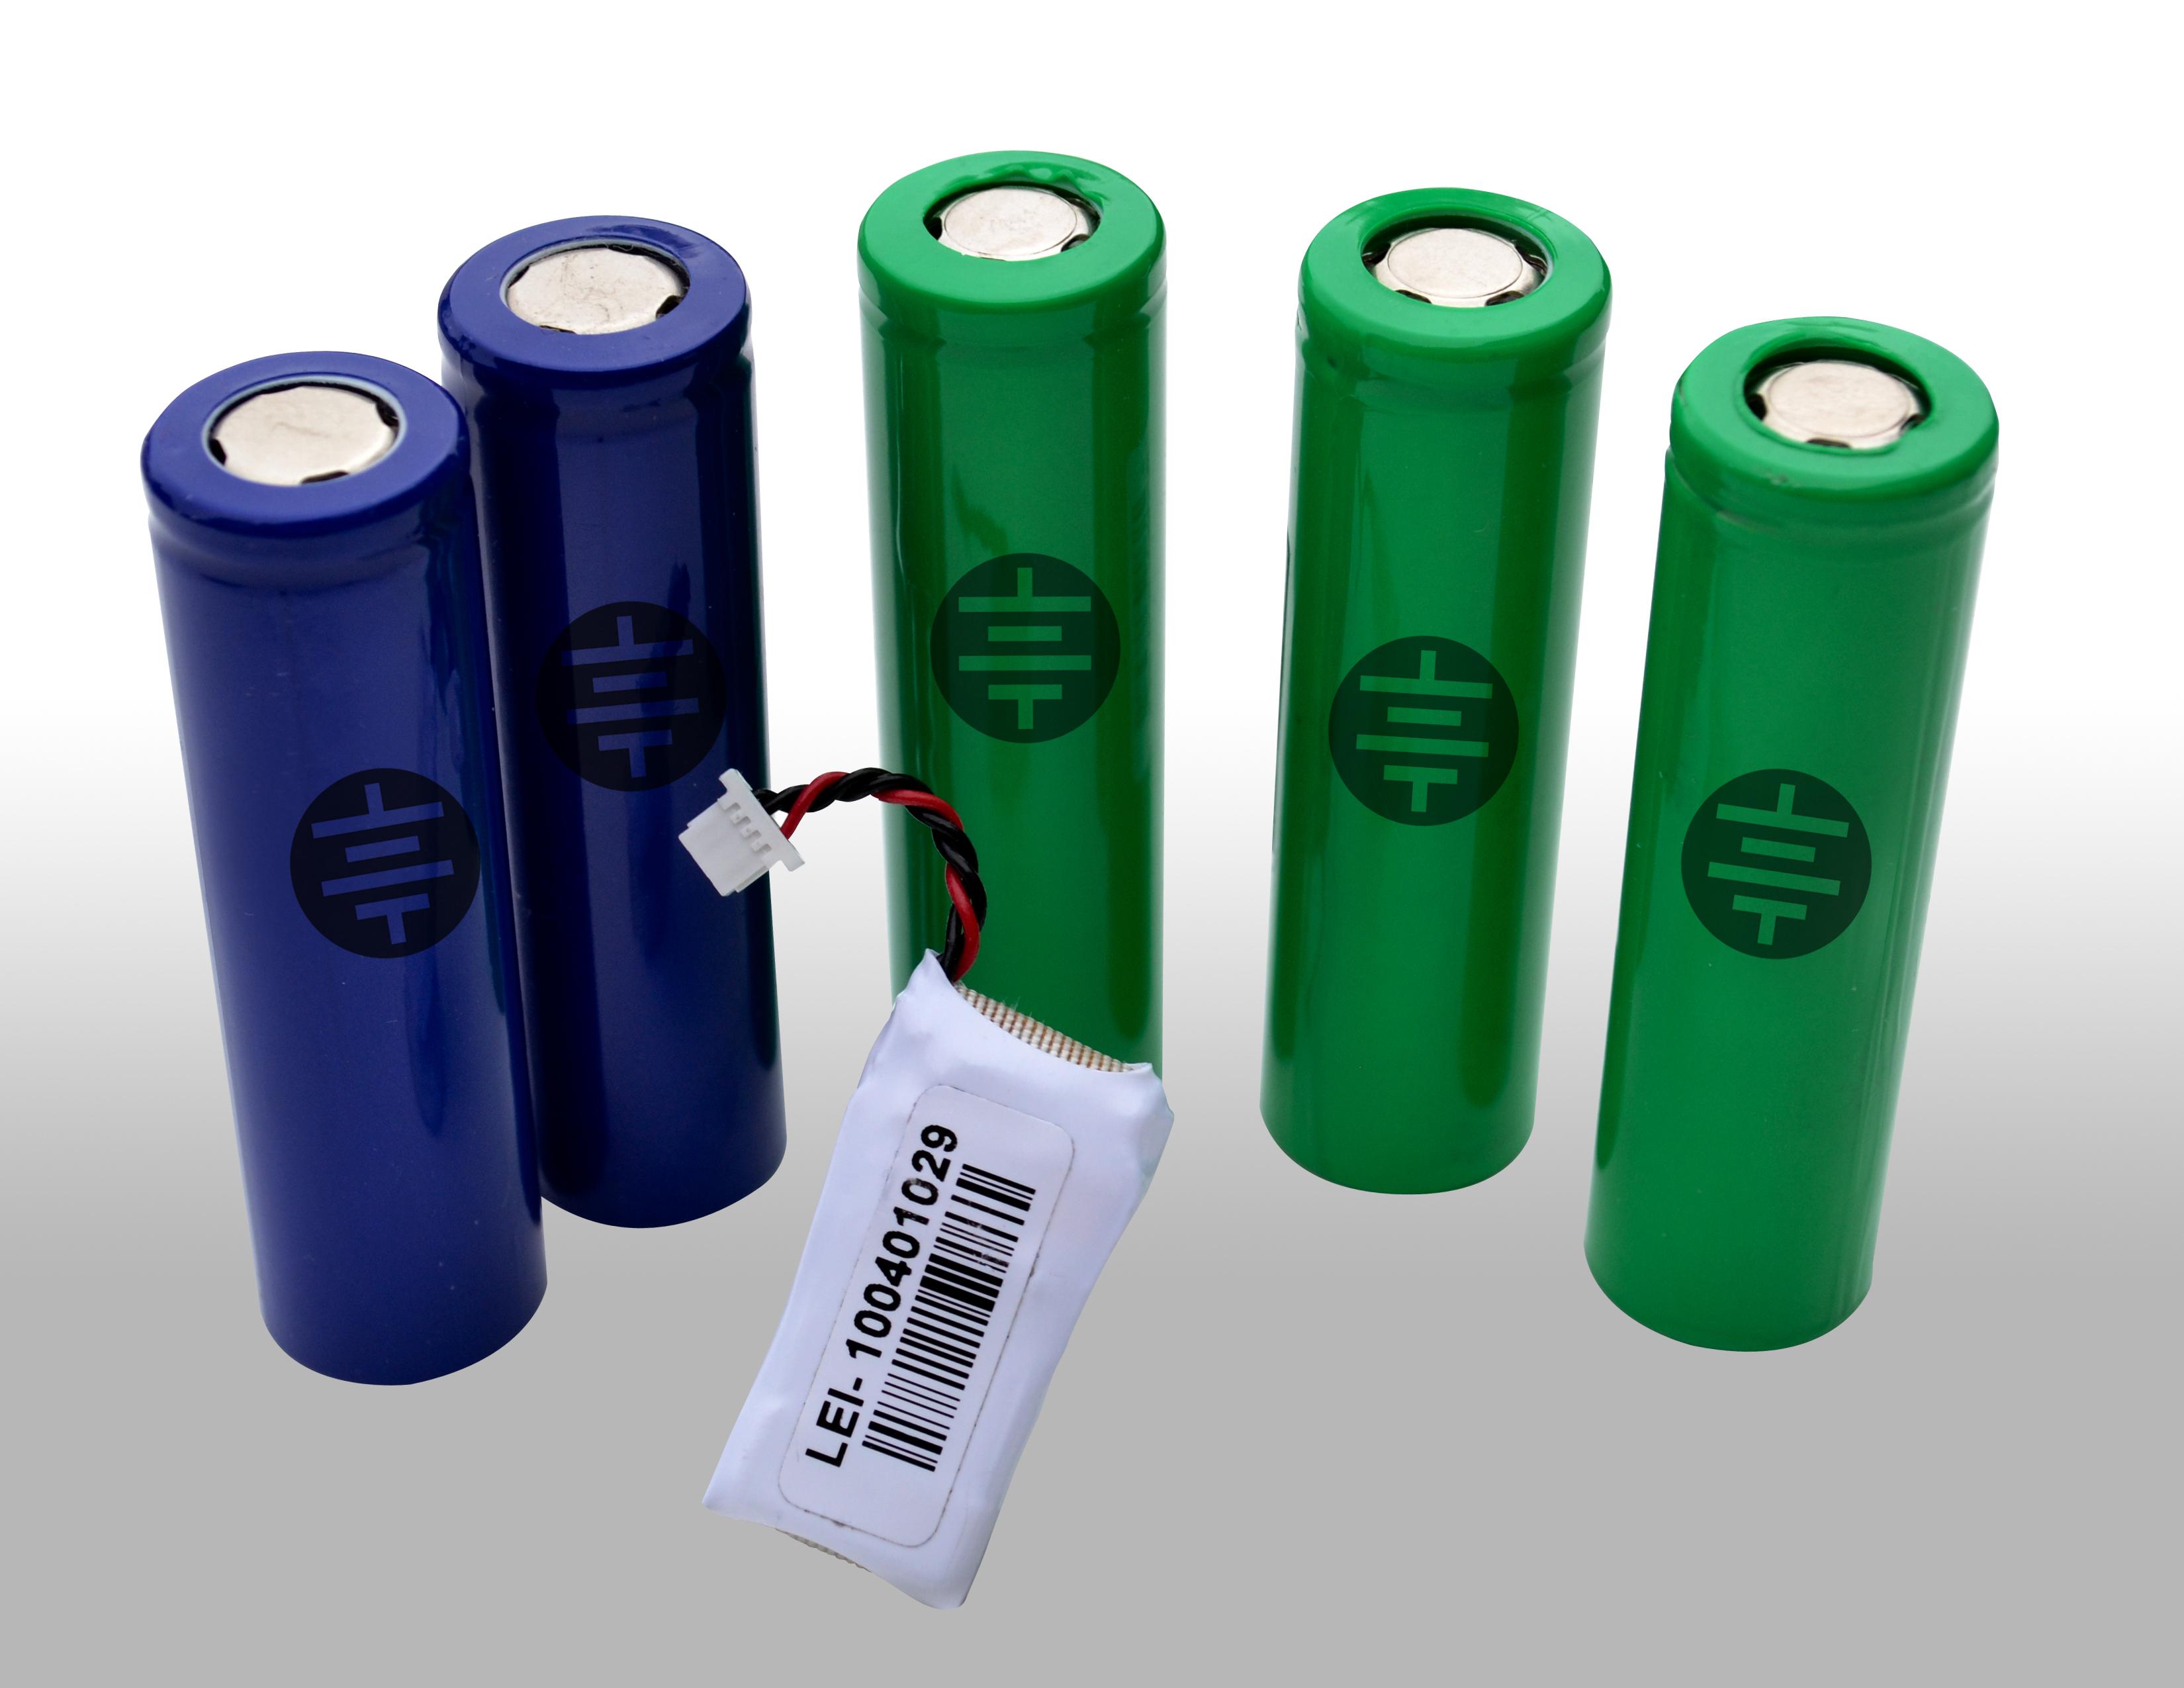 Leyden Energy lithium ion batteries, image courtesy of Leyden Energy.